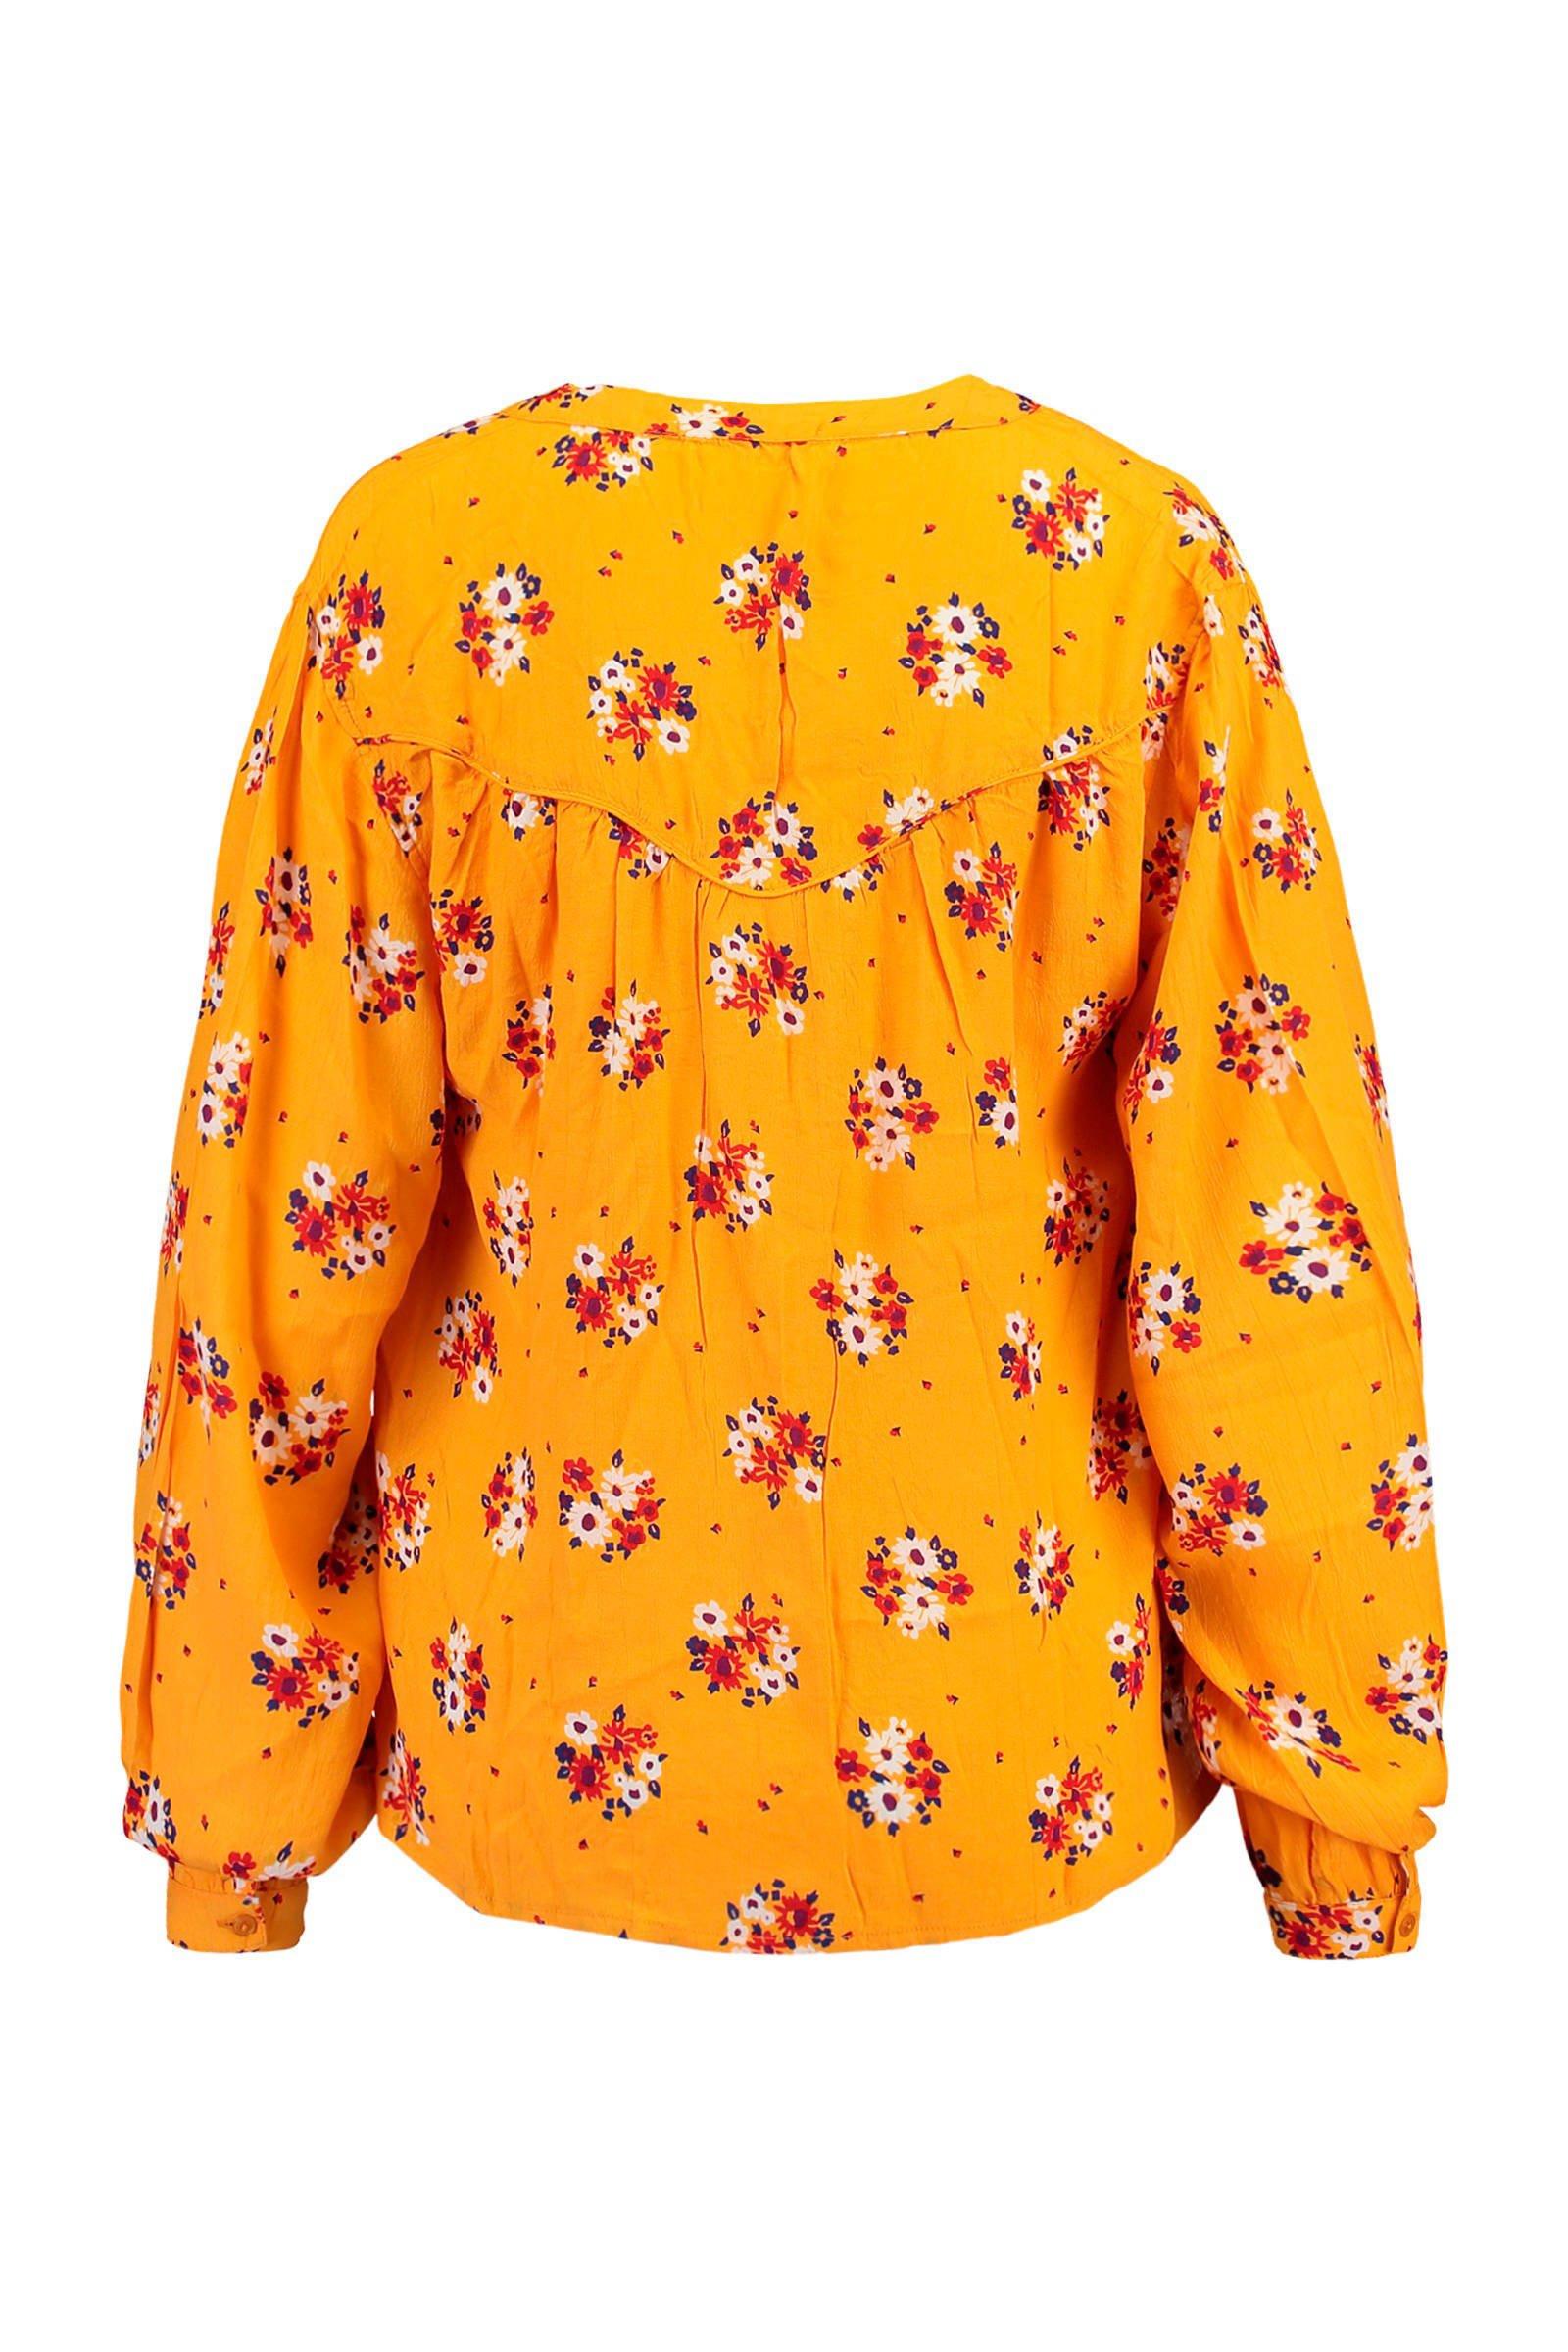 gebloemde America okergeel America blouse gebloemde blouse okergeel okergeel Today America Today Today gebloemde blouse gebloemde Today America qpR7q8